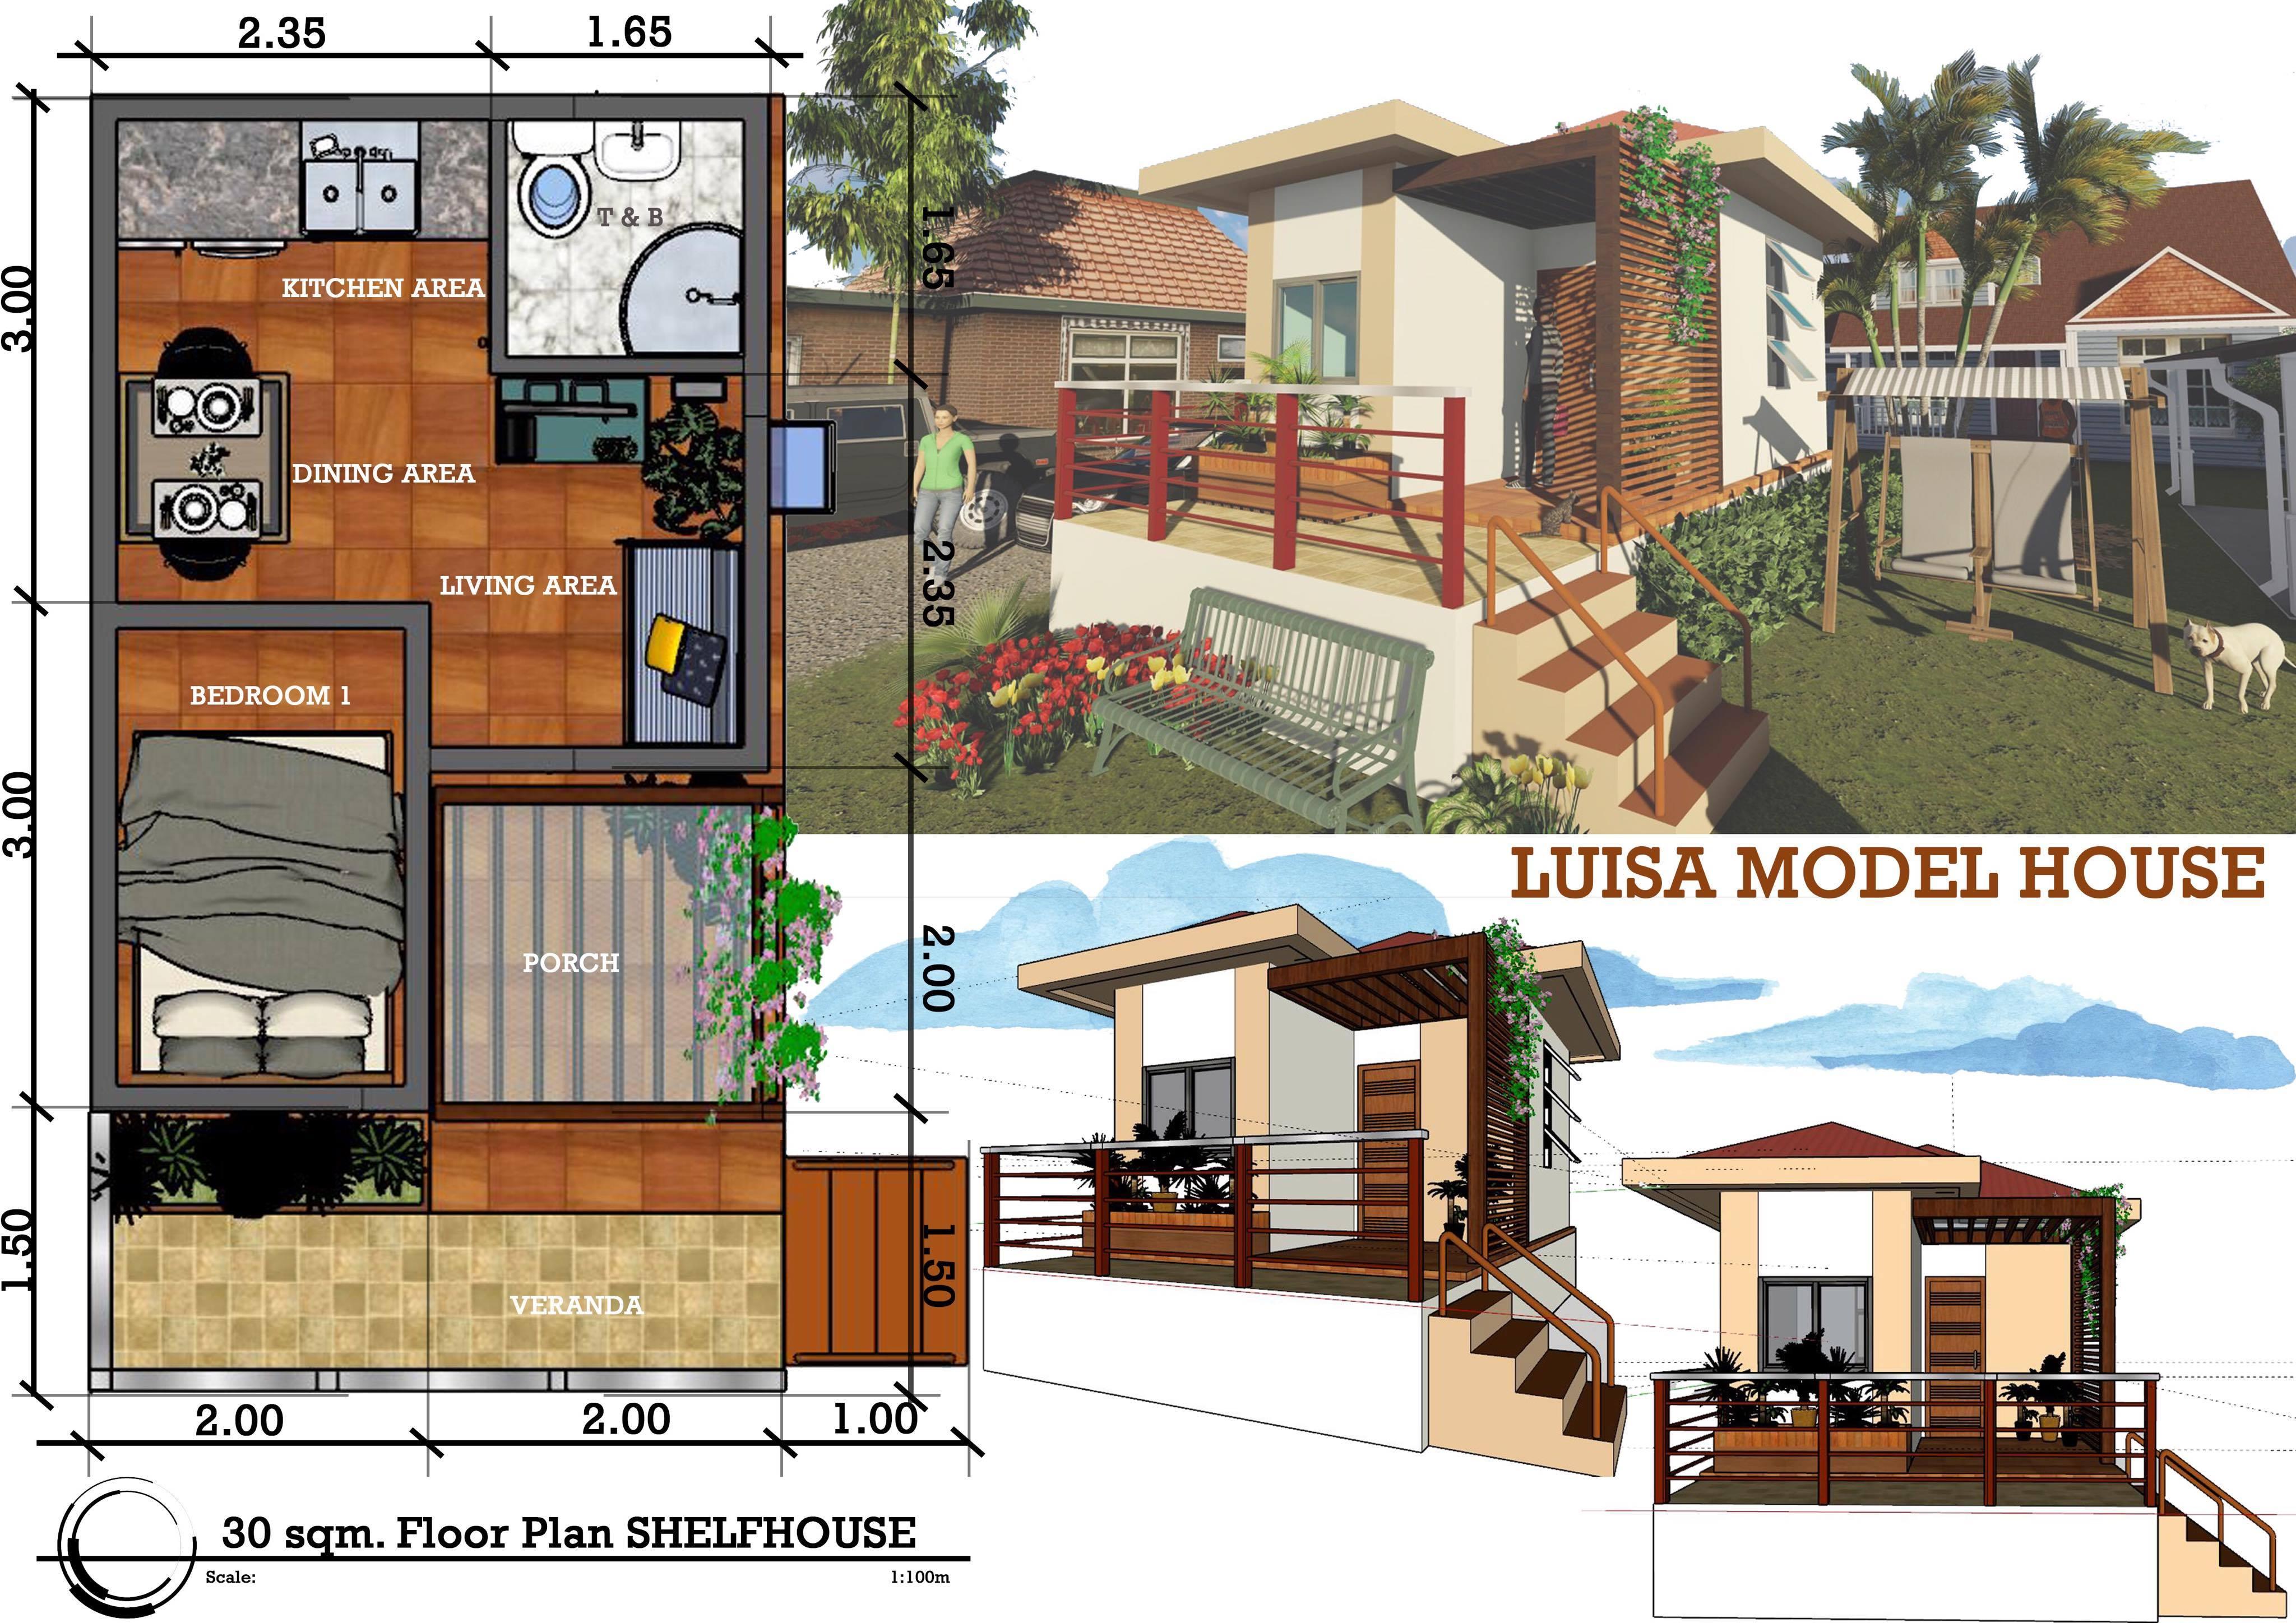 Luisa Model house